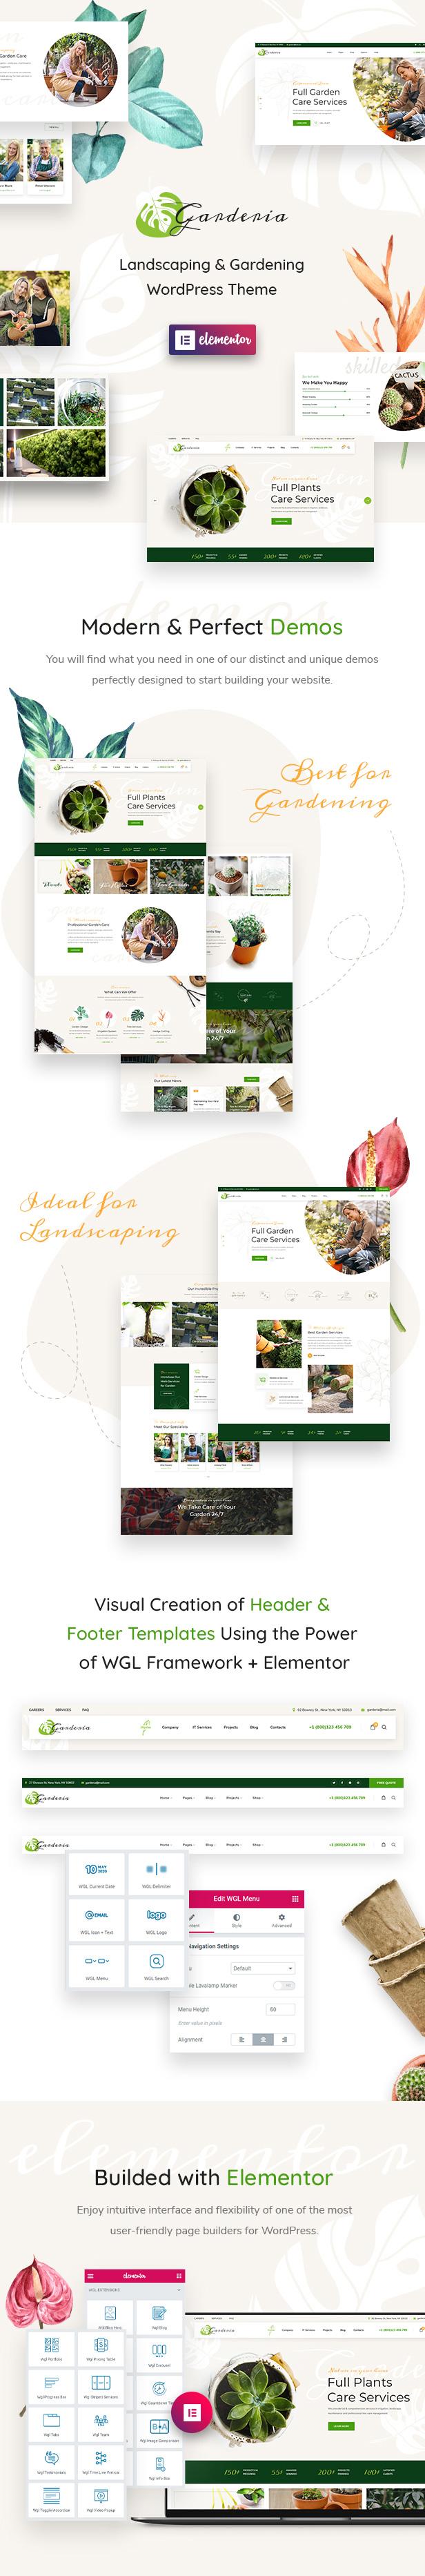 Garderia - Landscaping & Gardening  WordPress Theme - 1